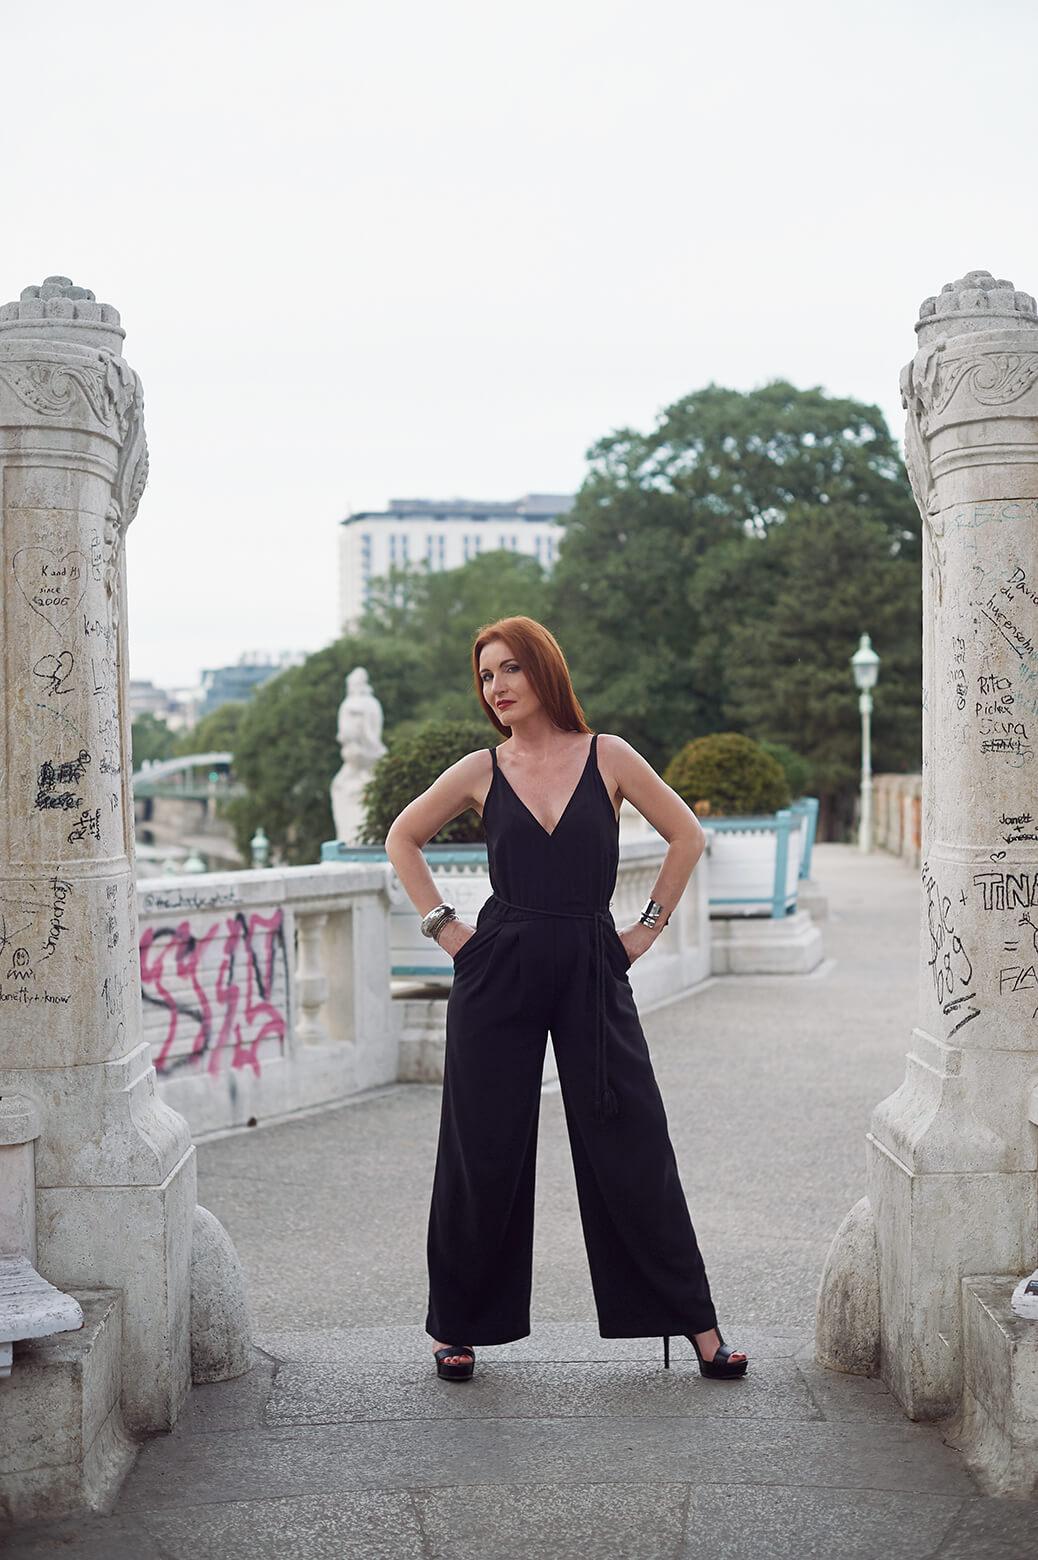 petra aschauer, dieAschauer, blogger, personal branding, photography, fotografie, wien, vienna, ursula schmitz, business portrait, portraiture